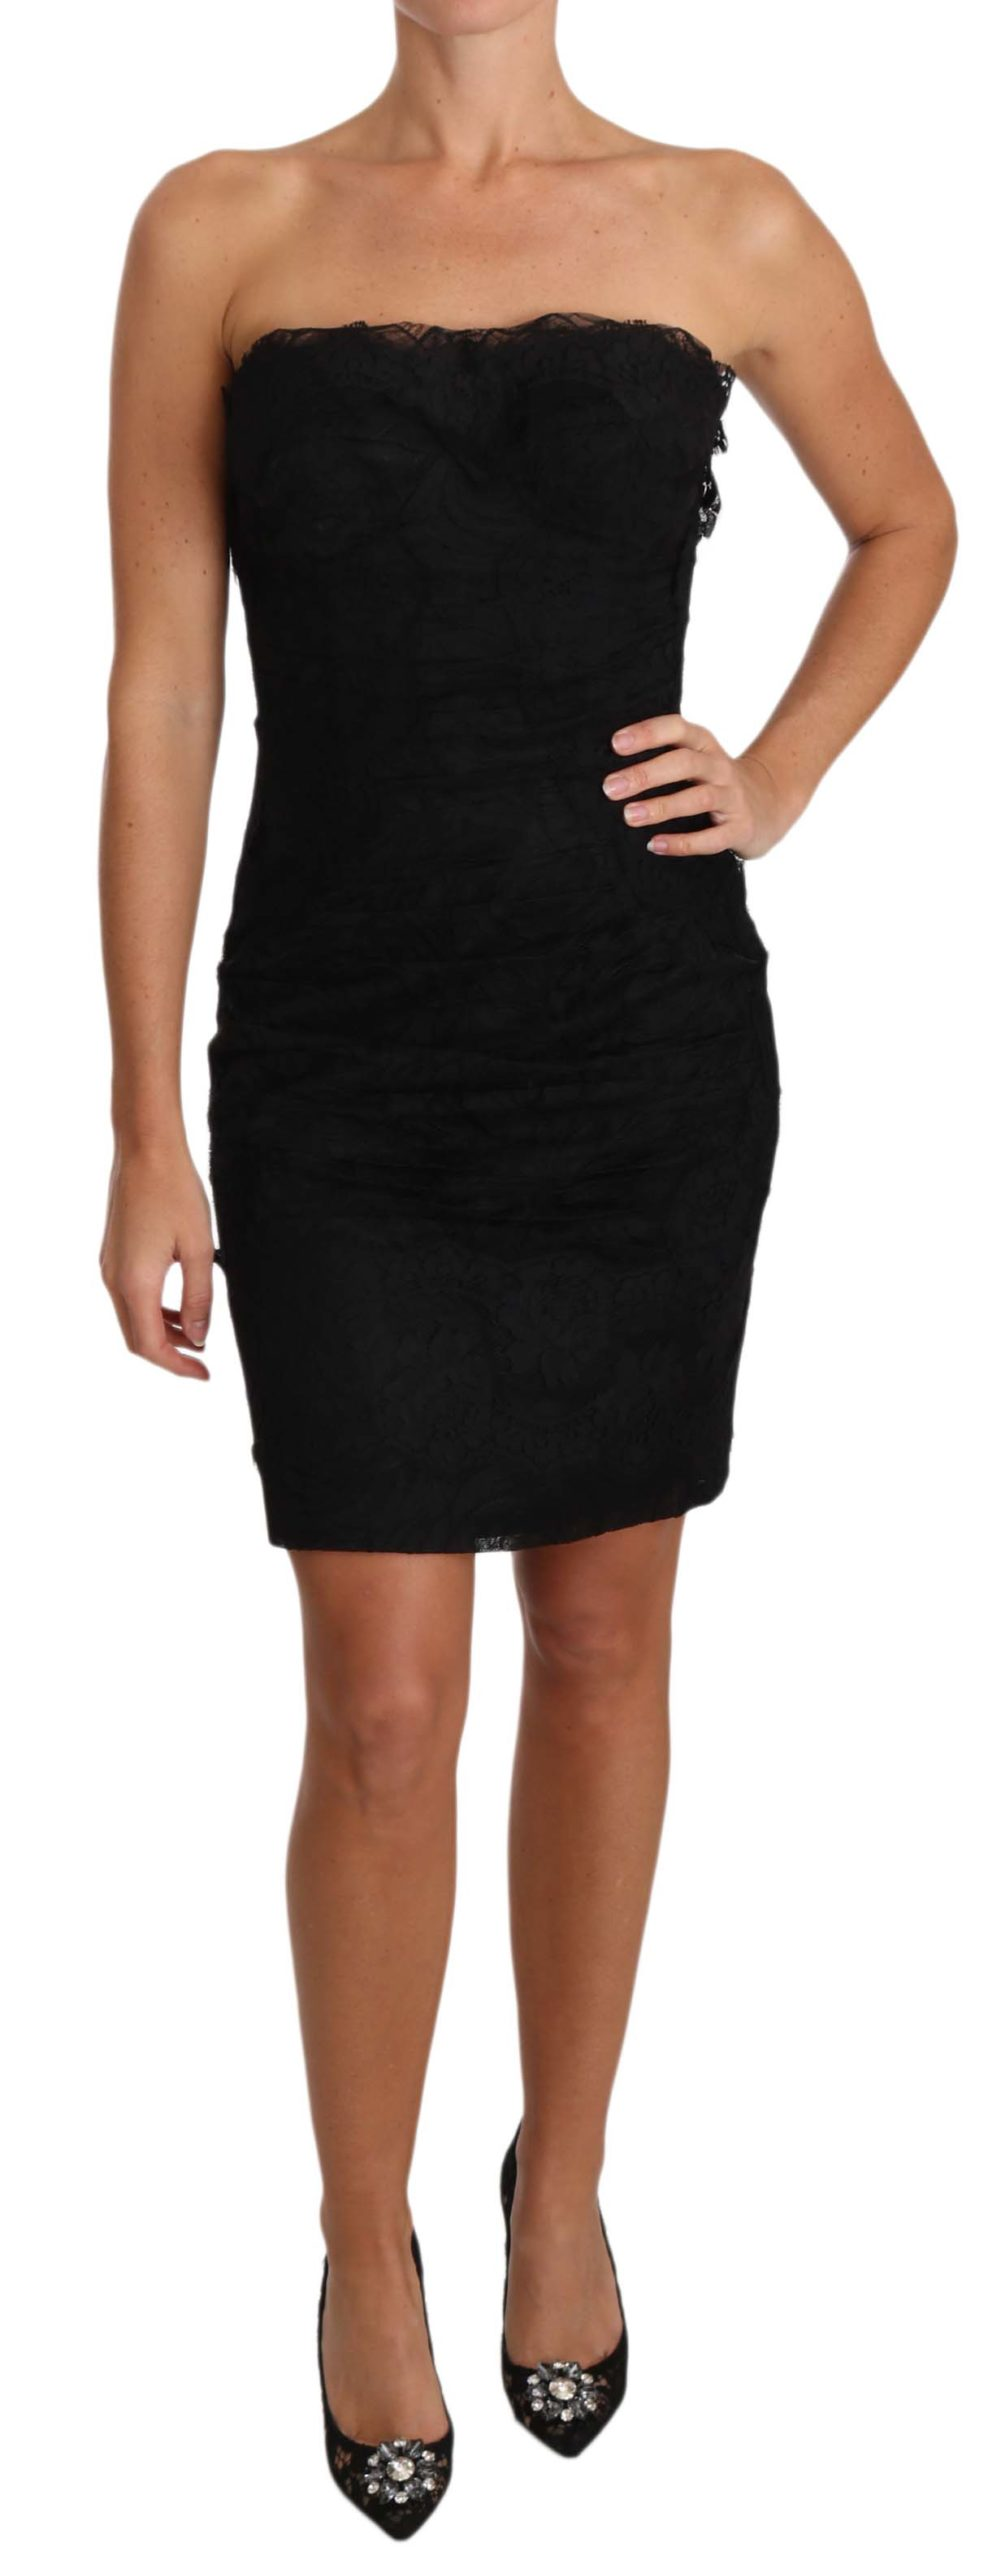 Dolce & Gabbana Women's Lace Strapless Mini Dress Black DR2021 - IT42 M